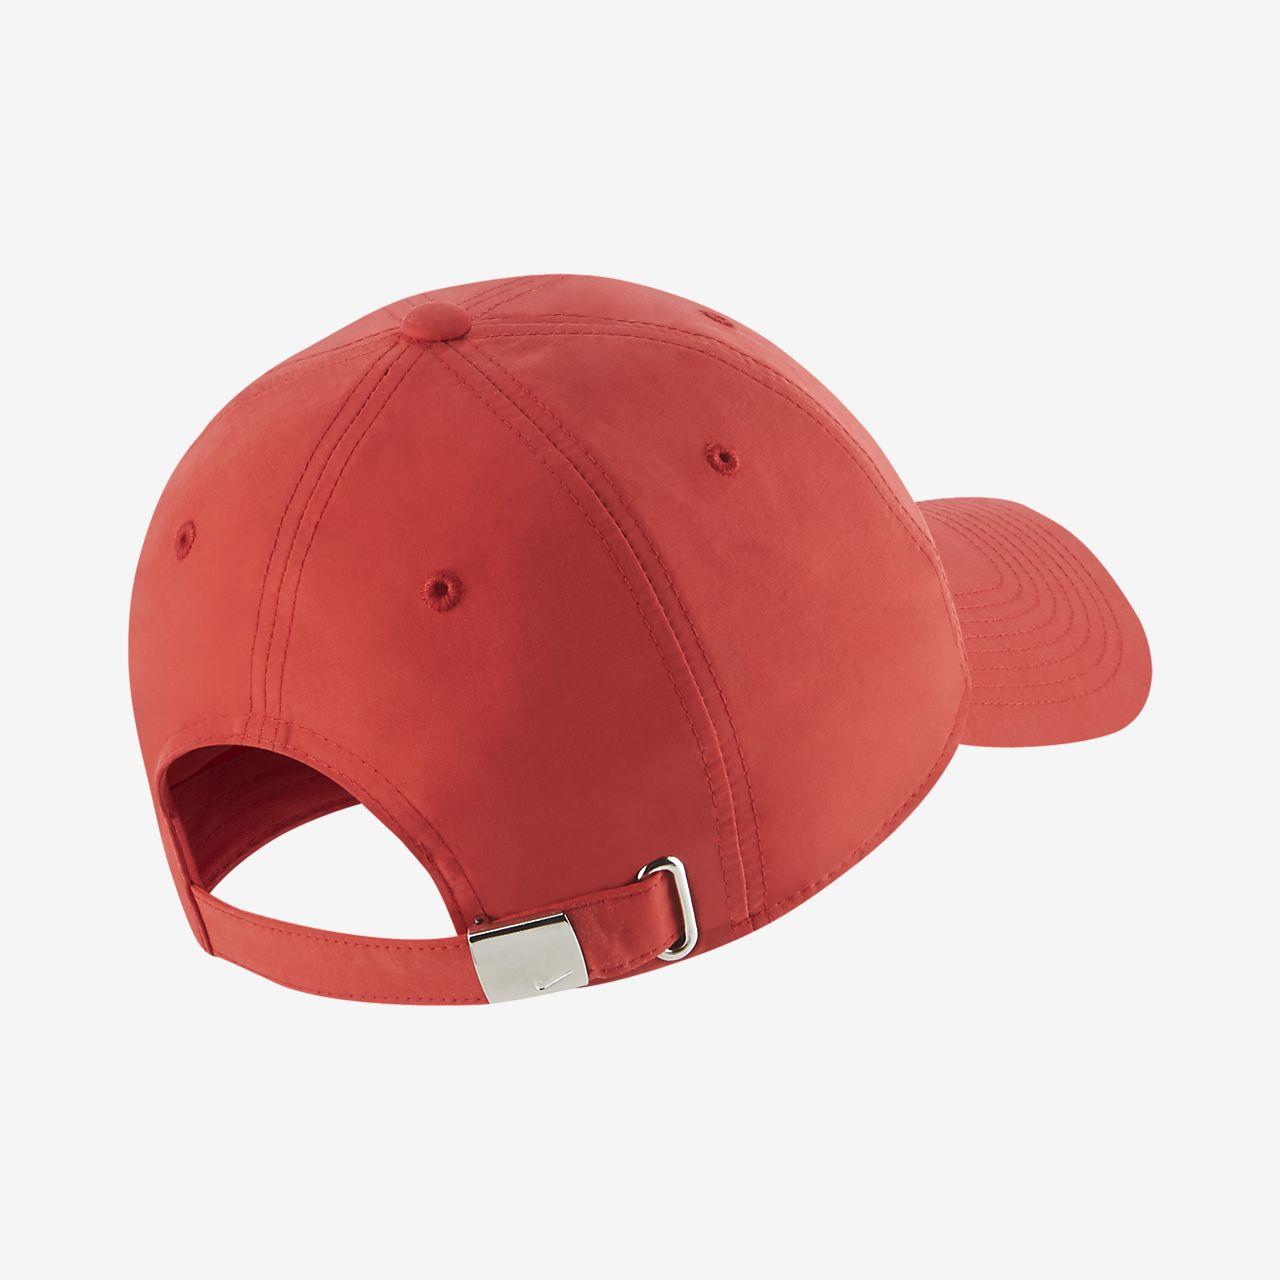 5d736fd9eb7 Nike Sportswear Metal Swoosh Logo Adjustable Hat. Nike.com IN